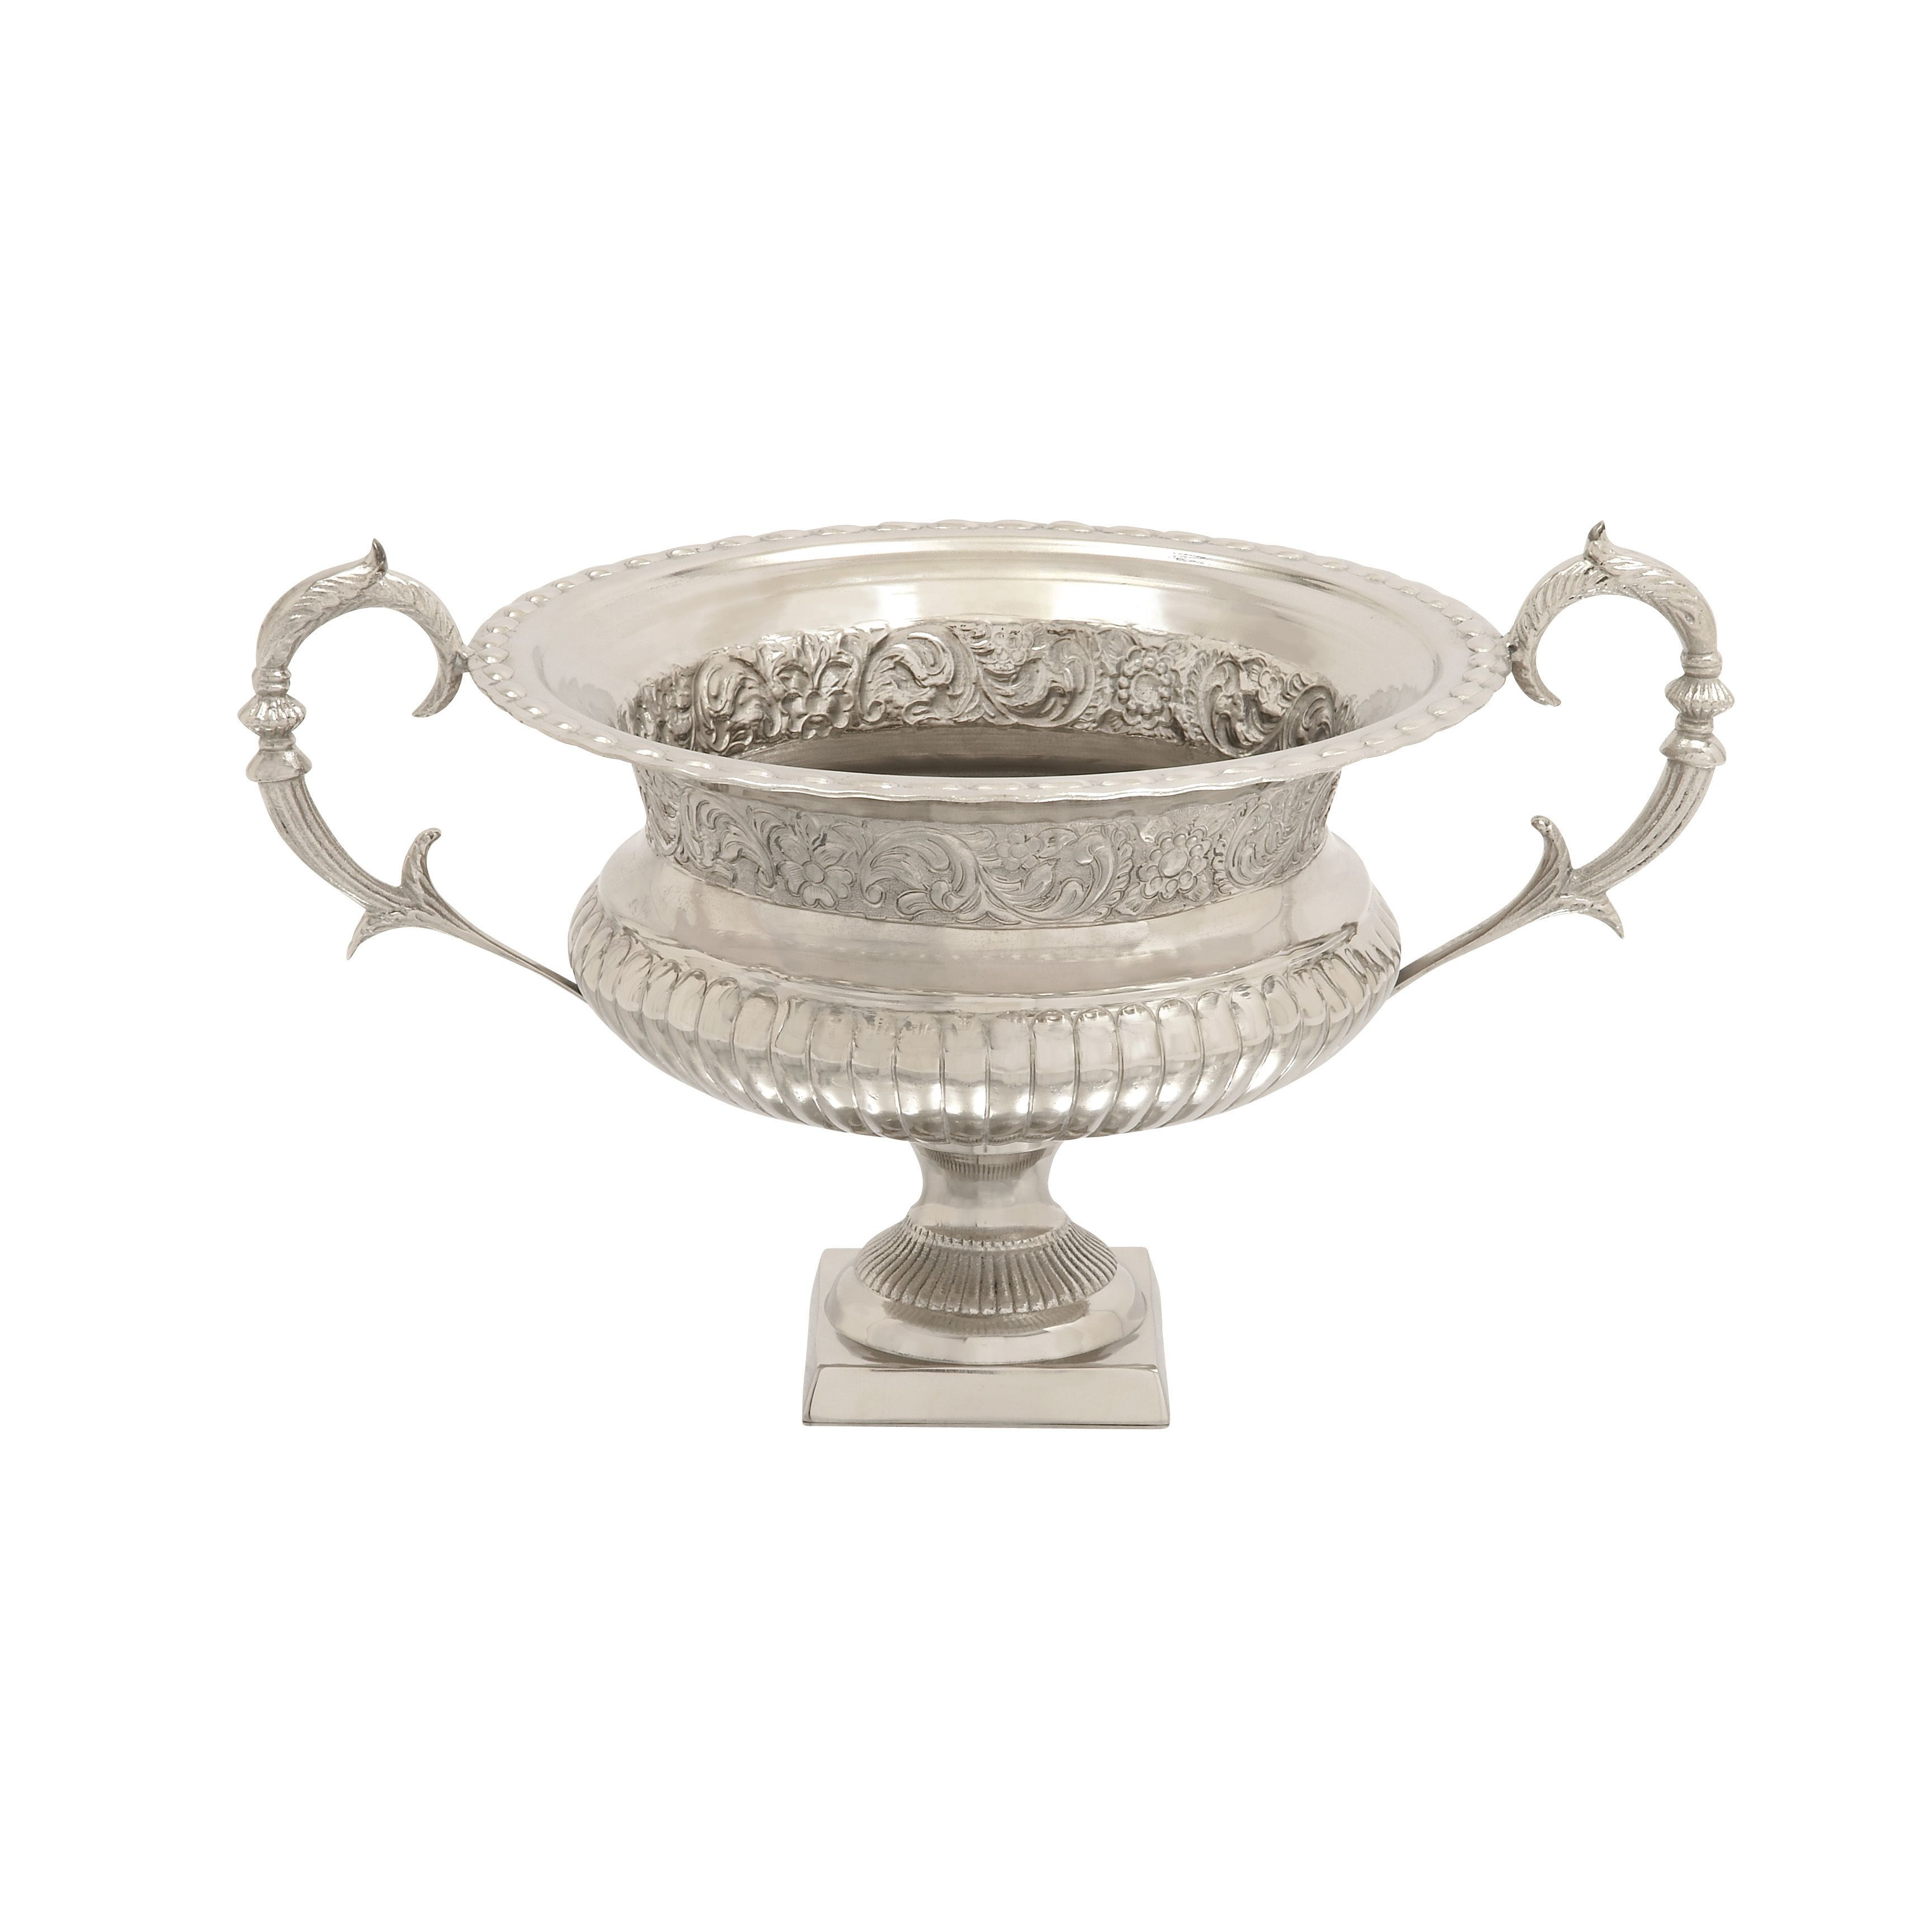 Benzara Aluminum Handle Urn 23-inch x 14-inch (Silver), Black (Acacia)